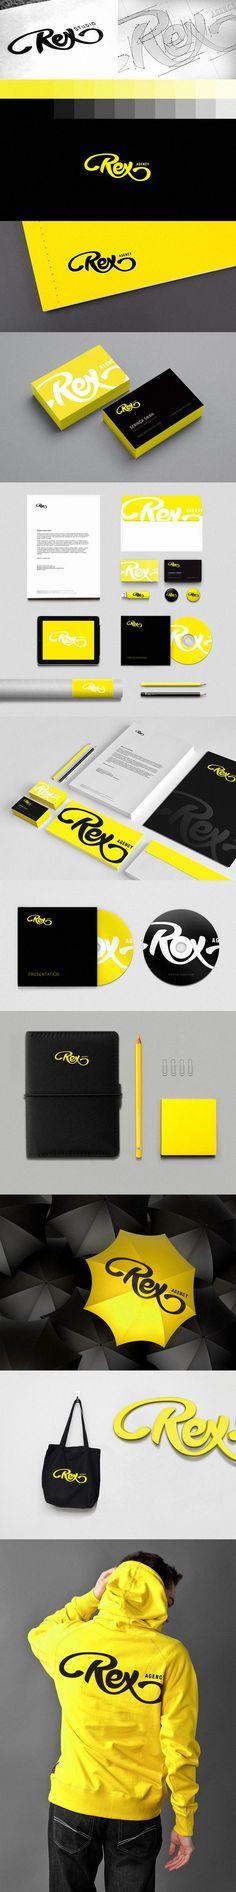 REX #Branding, #Business #Card, #Logo, #Marketing, #Stationary, #Yellow: